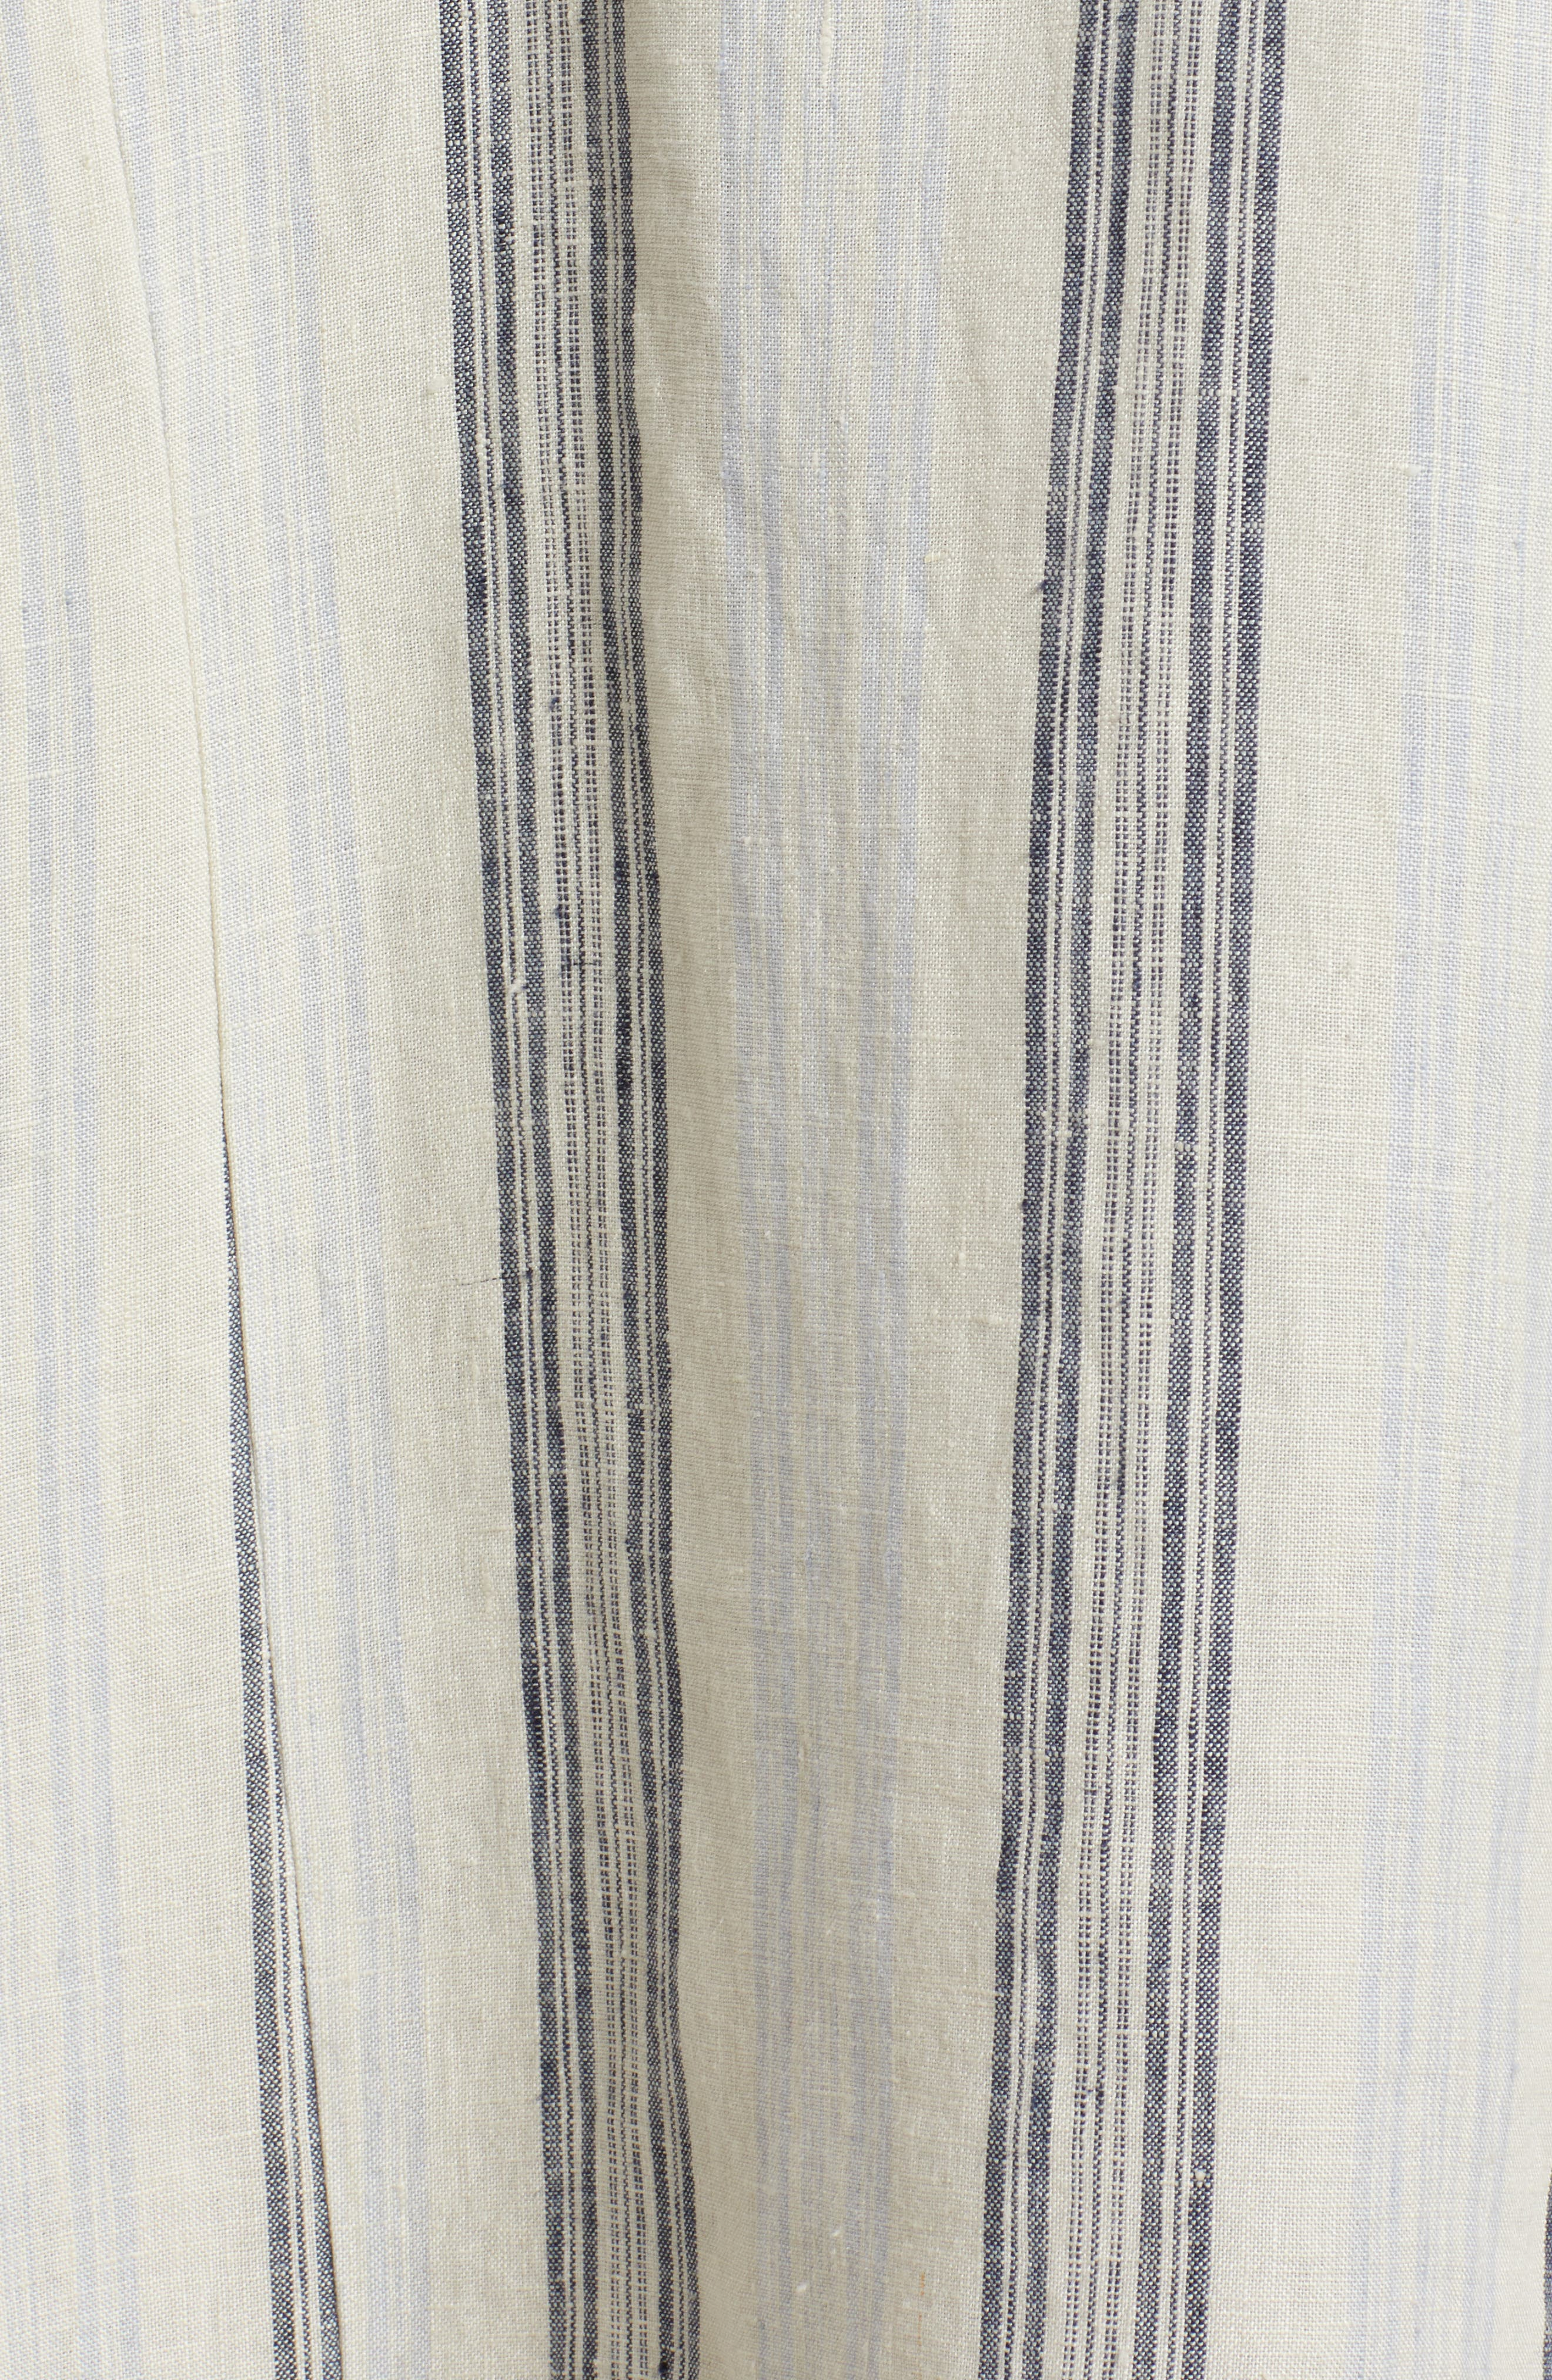 Stripe Linen Keyhole Shift Dress,                             Alternate thumbnail 6, color,                             Beige Rainy Day Frankie Stripe